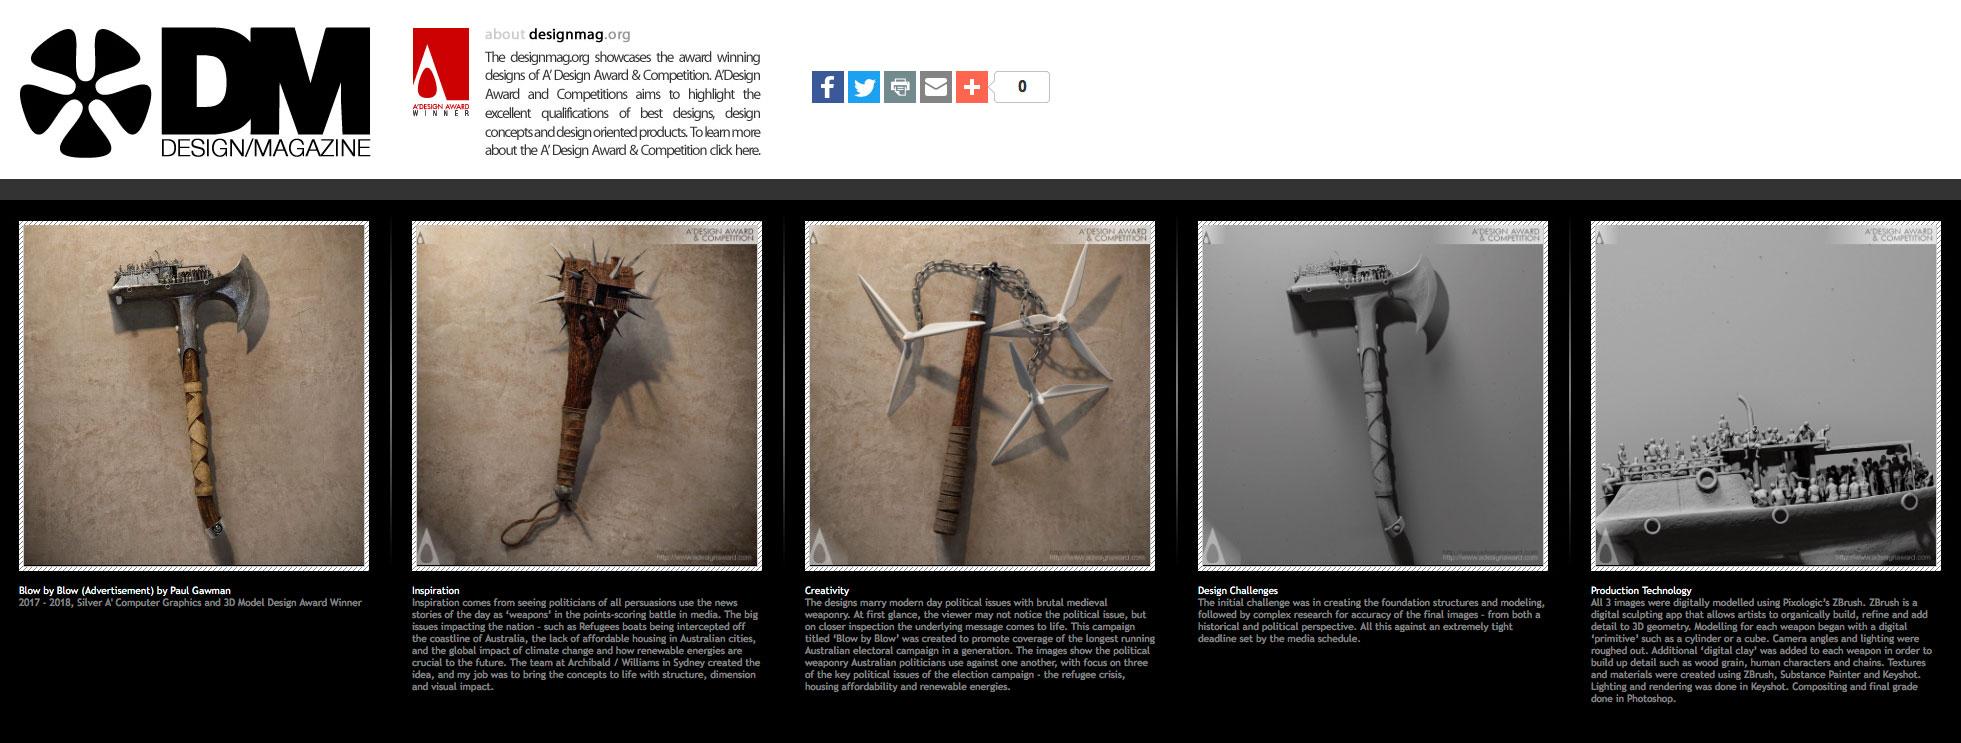 Design_Mag_02.jpg